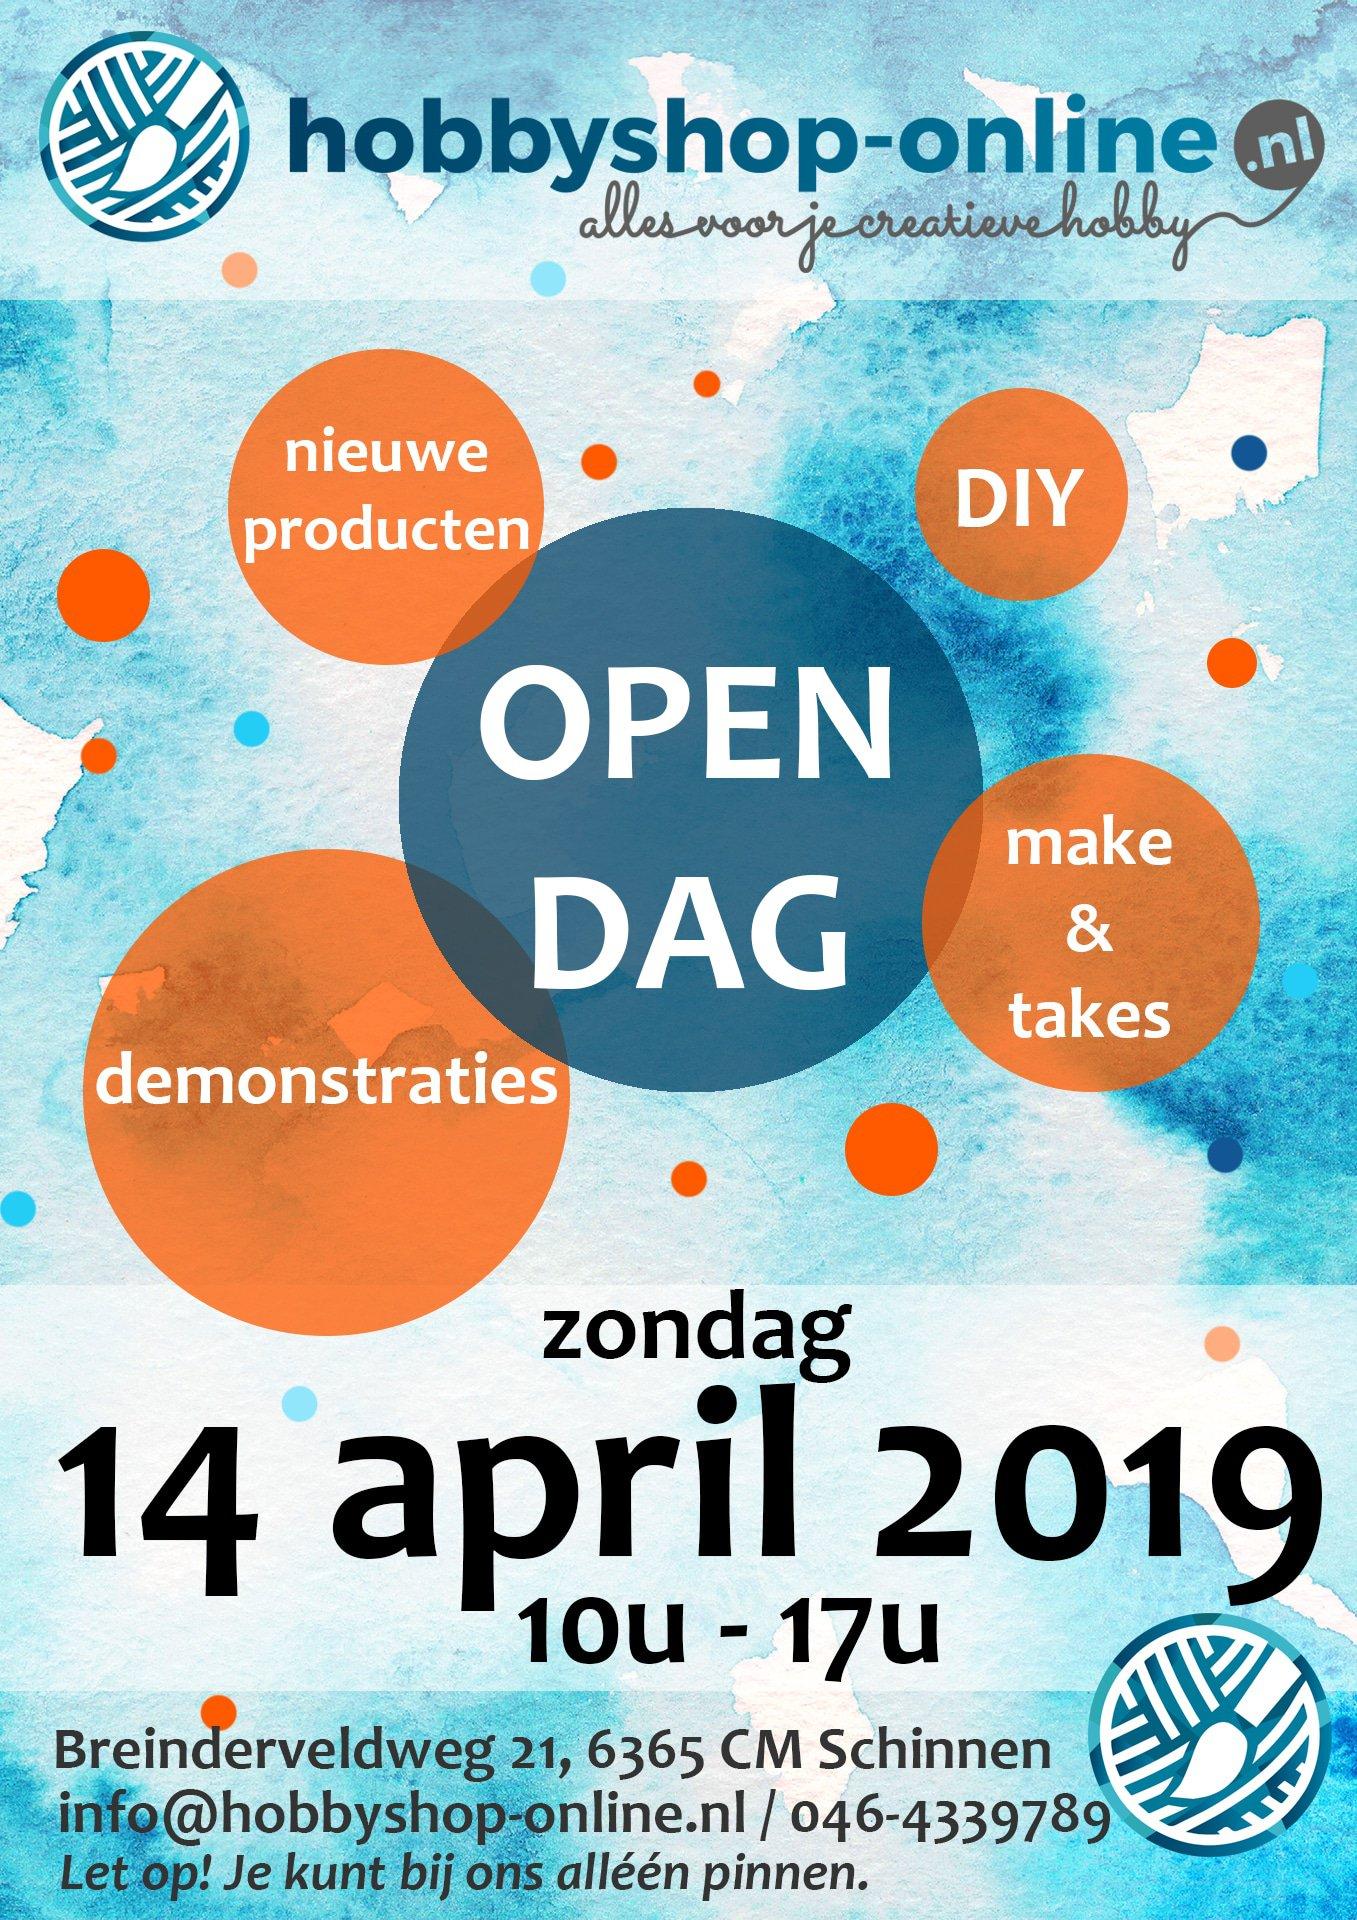 Open dag 14 april 2019